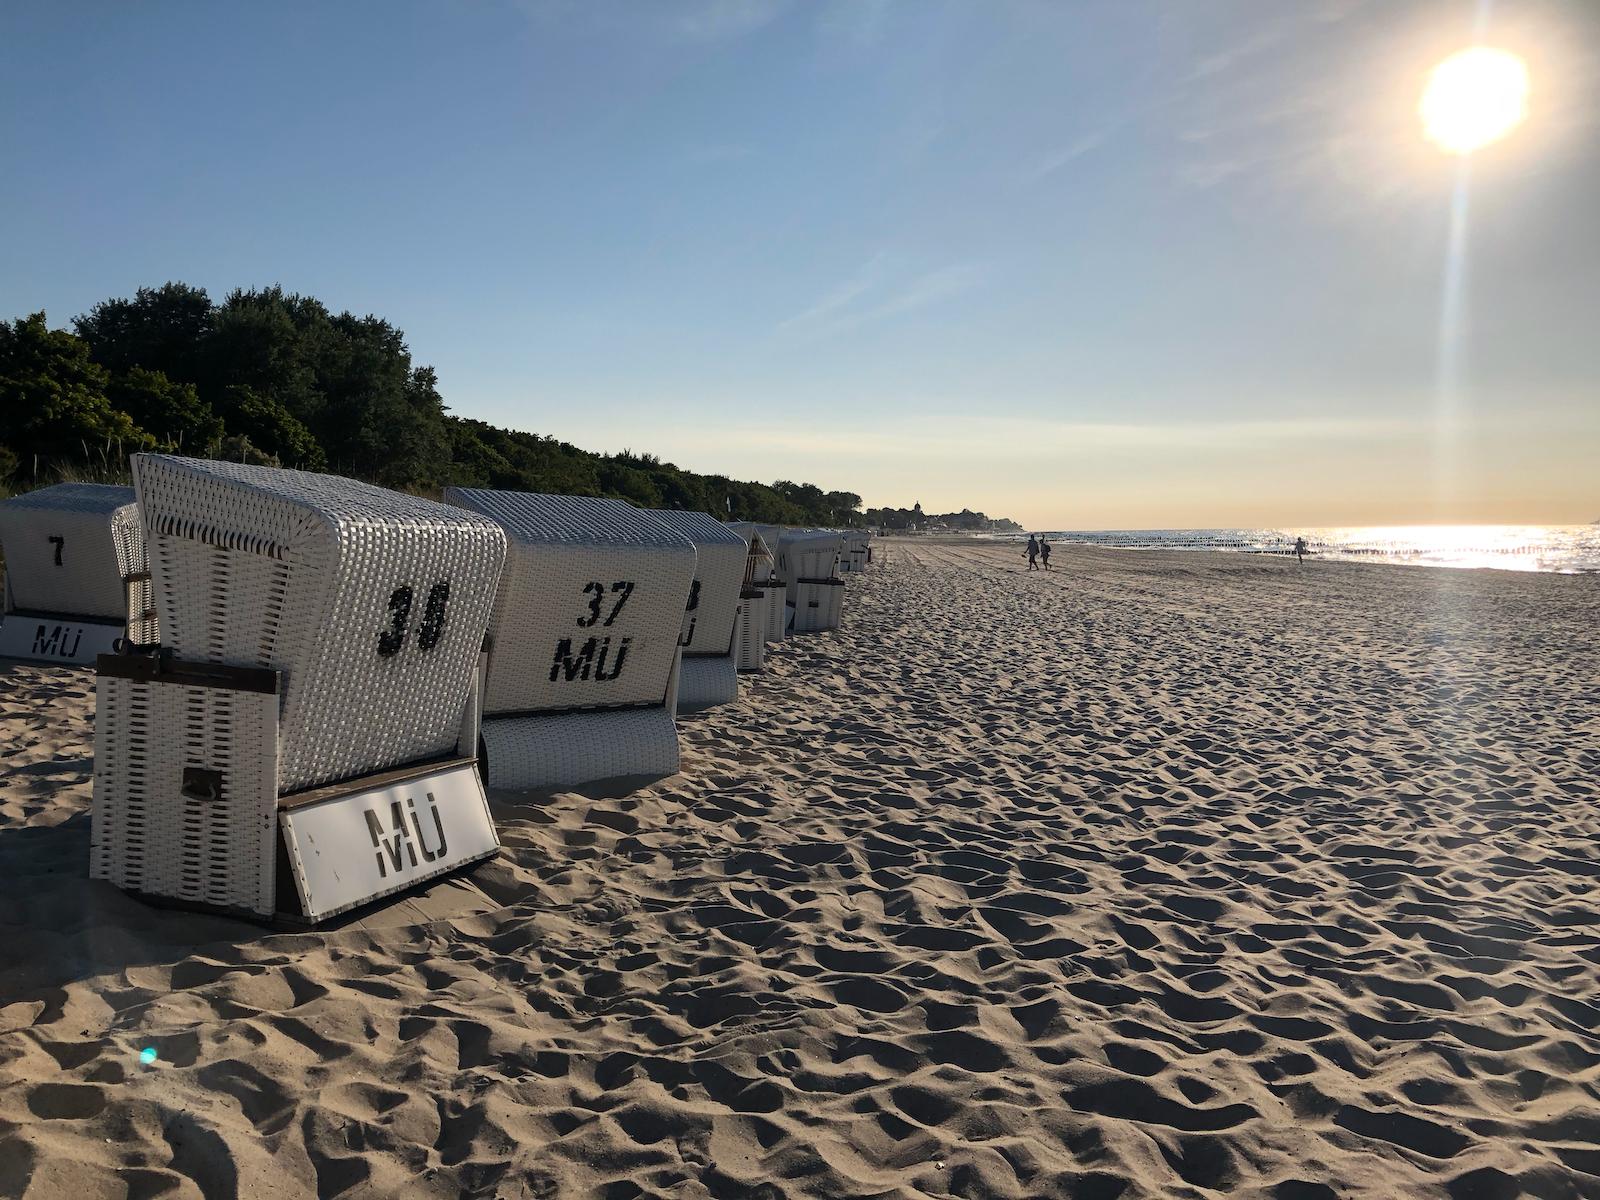 Strandkörbe in Kühlungsborn